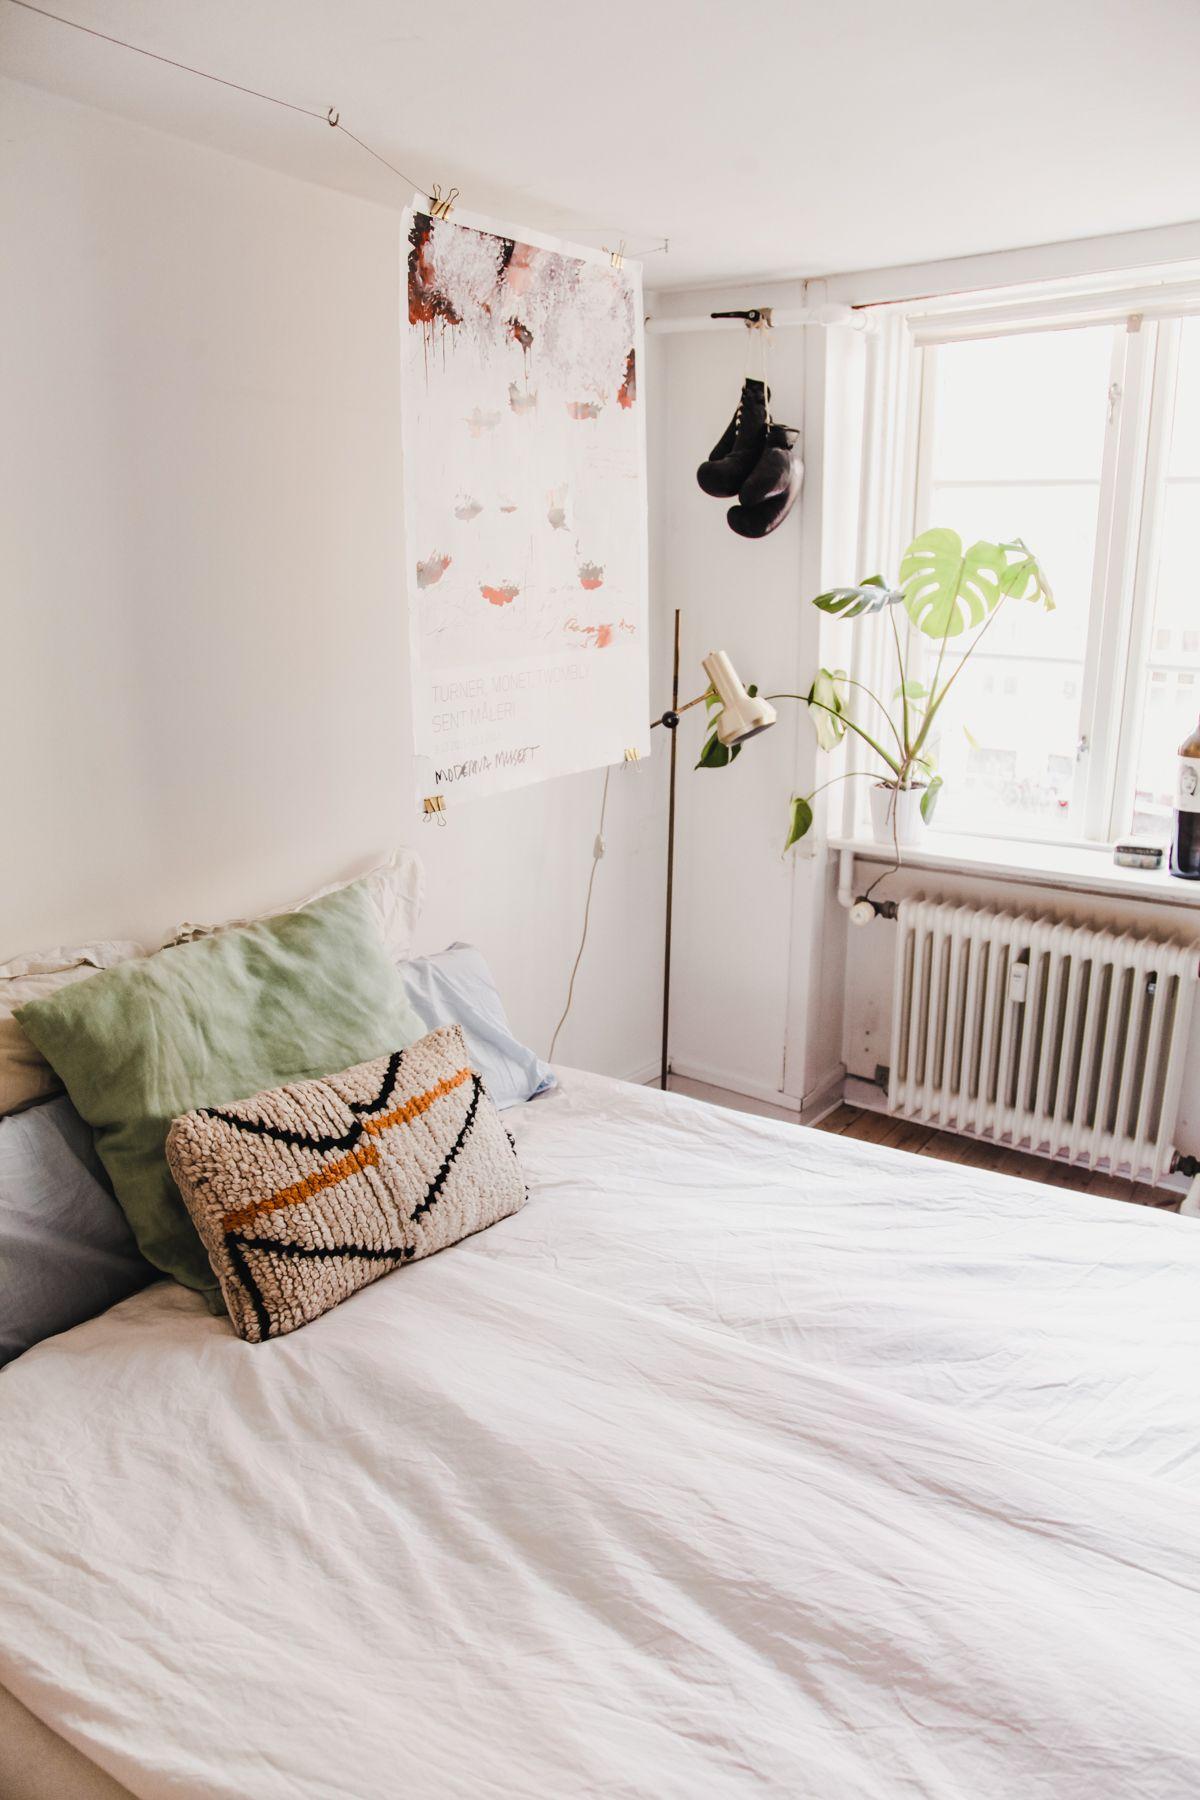 Two Duvets System In Scandinavia Duvet Scandinavian Bedding Bedding Brands